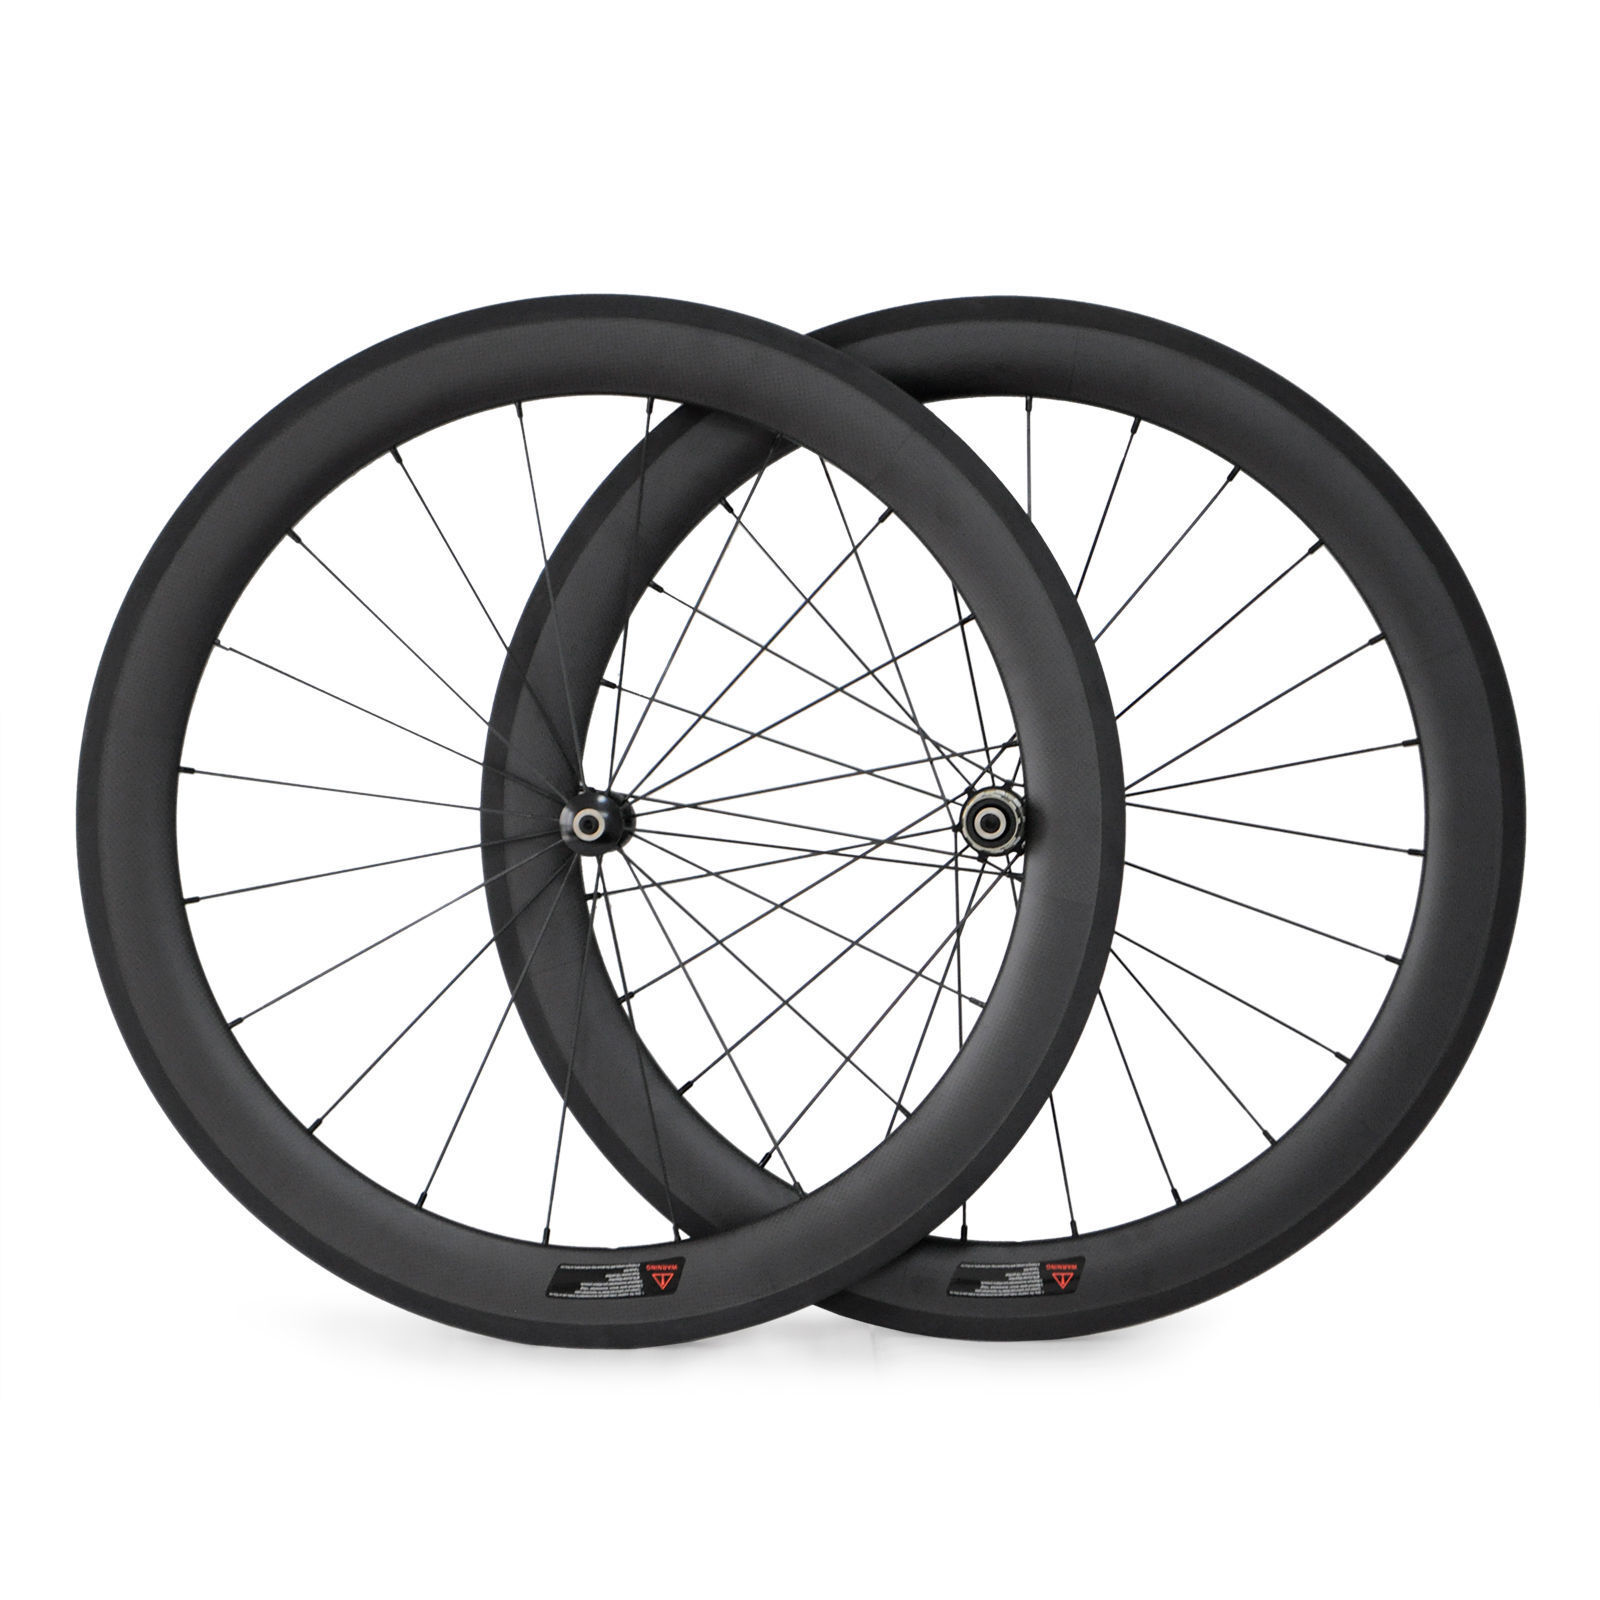 700C 60mm Straight Pull Carbon Road Bike Wheels RacingBicycle Wheelset 23mmWidth